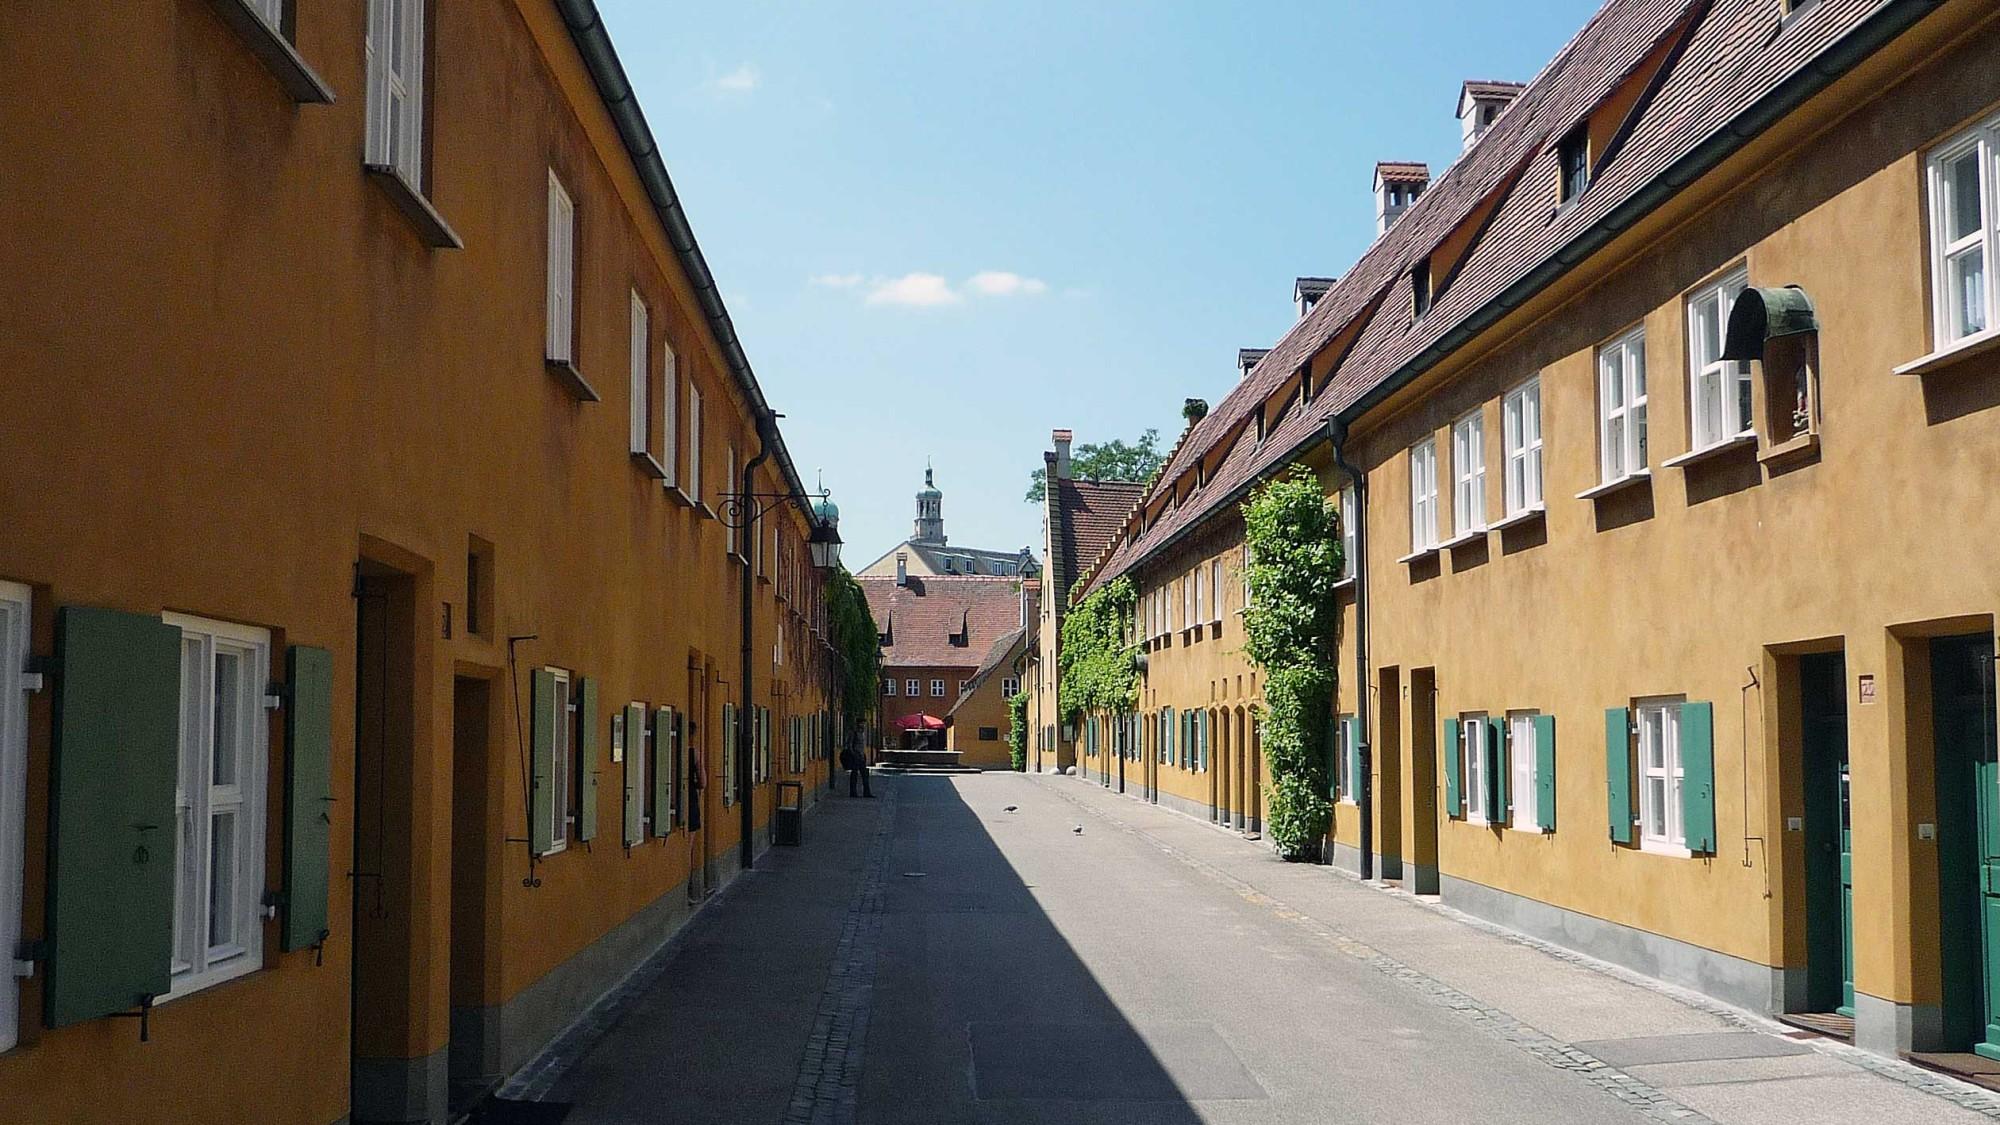 Augsburg: Fuggerei ulička sociálního sídliště